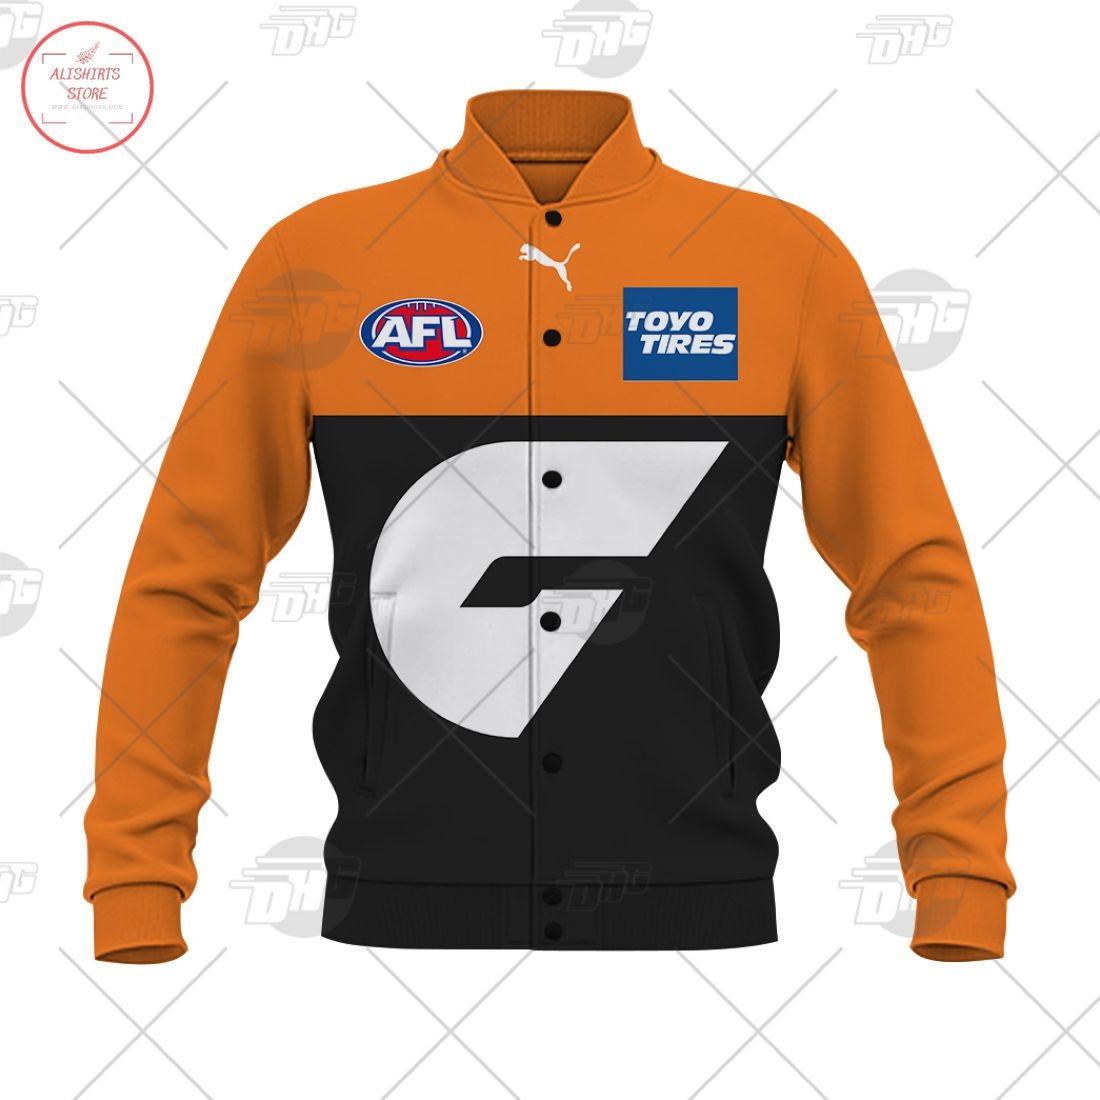 Personalized AFL Gws Giants 2021 Letterman Jacket